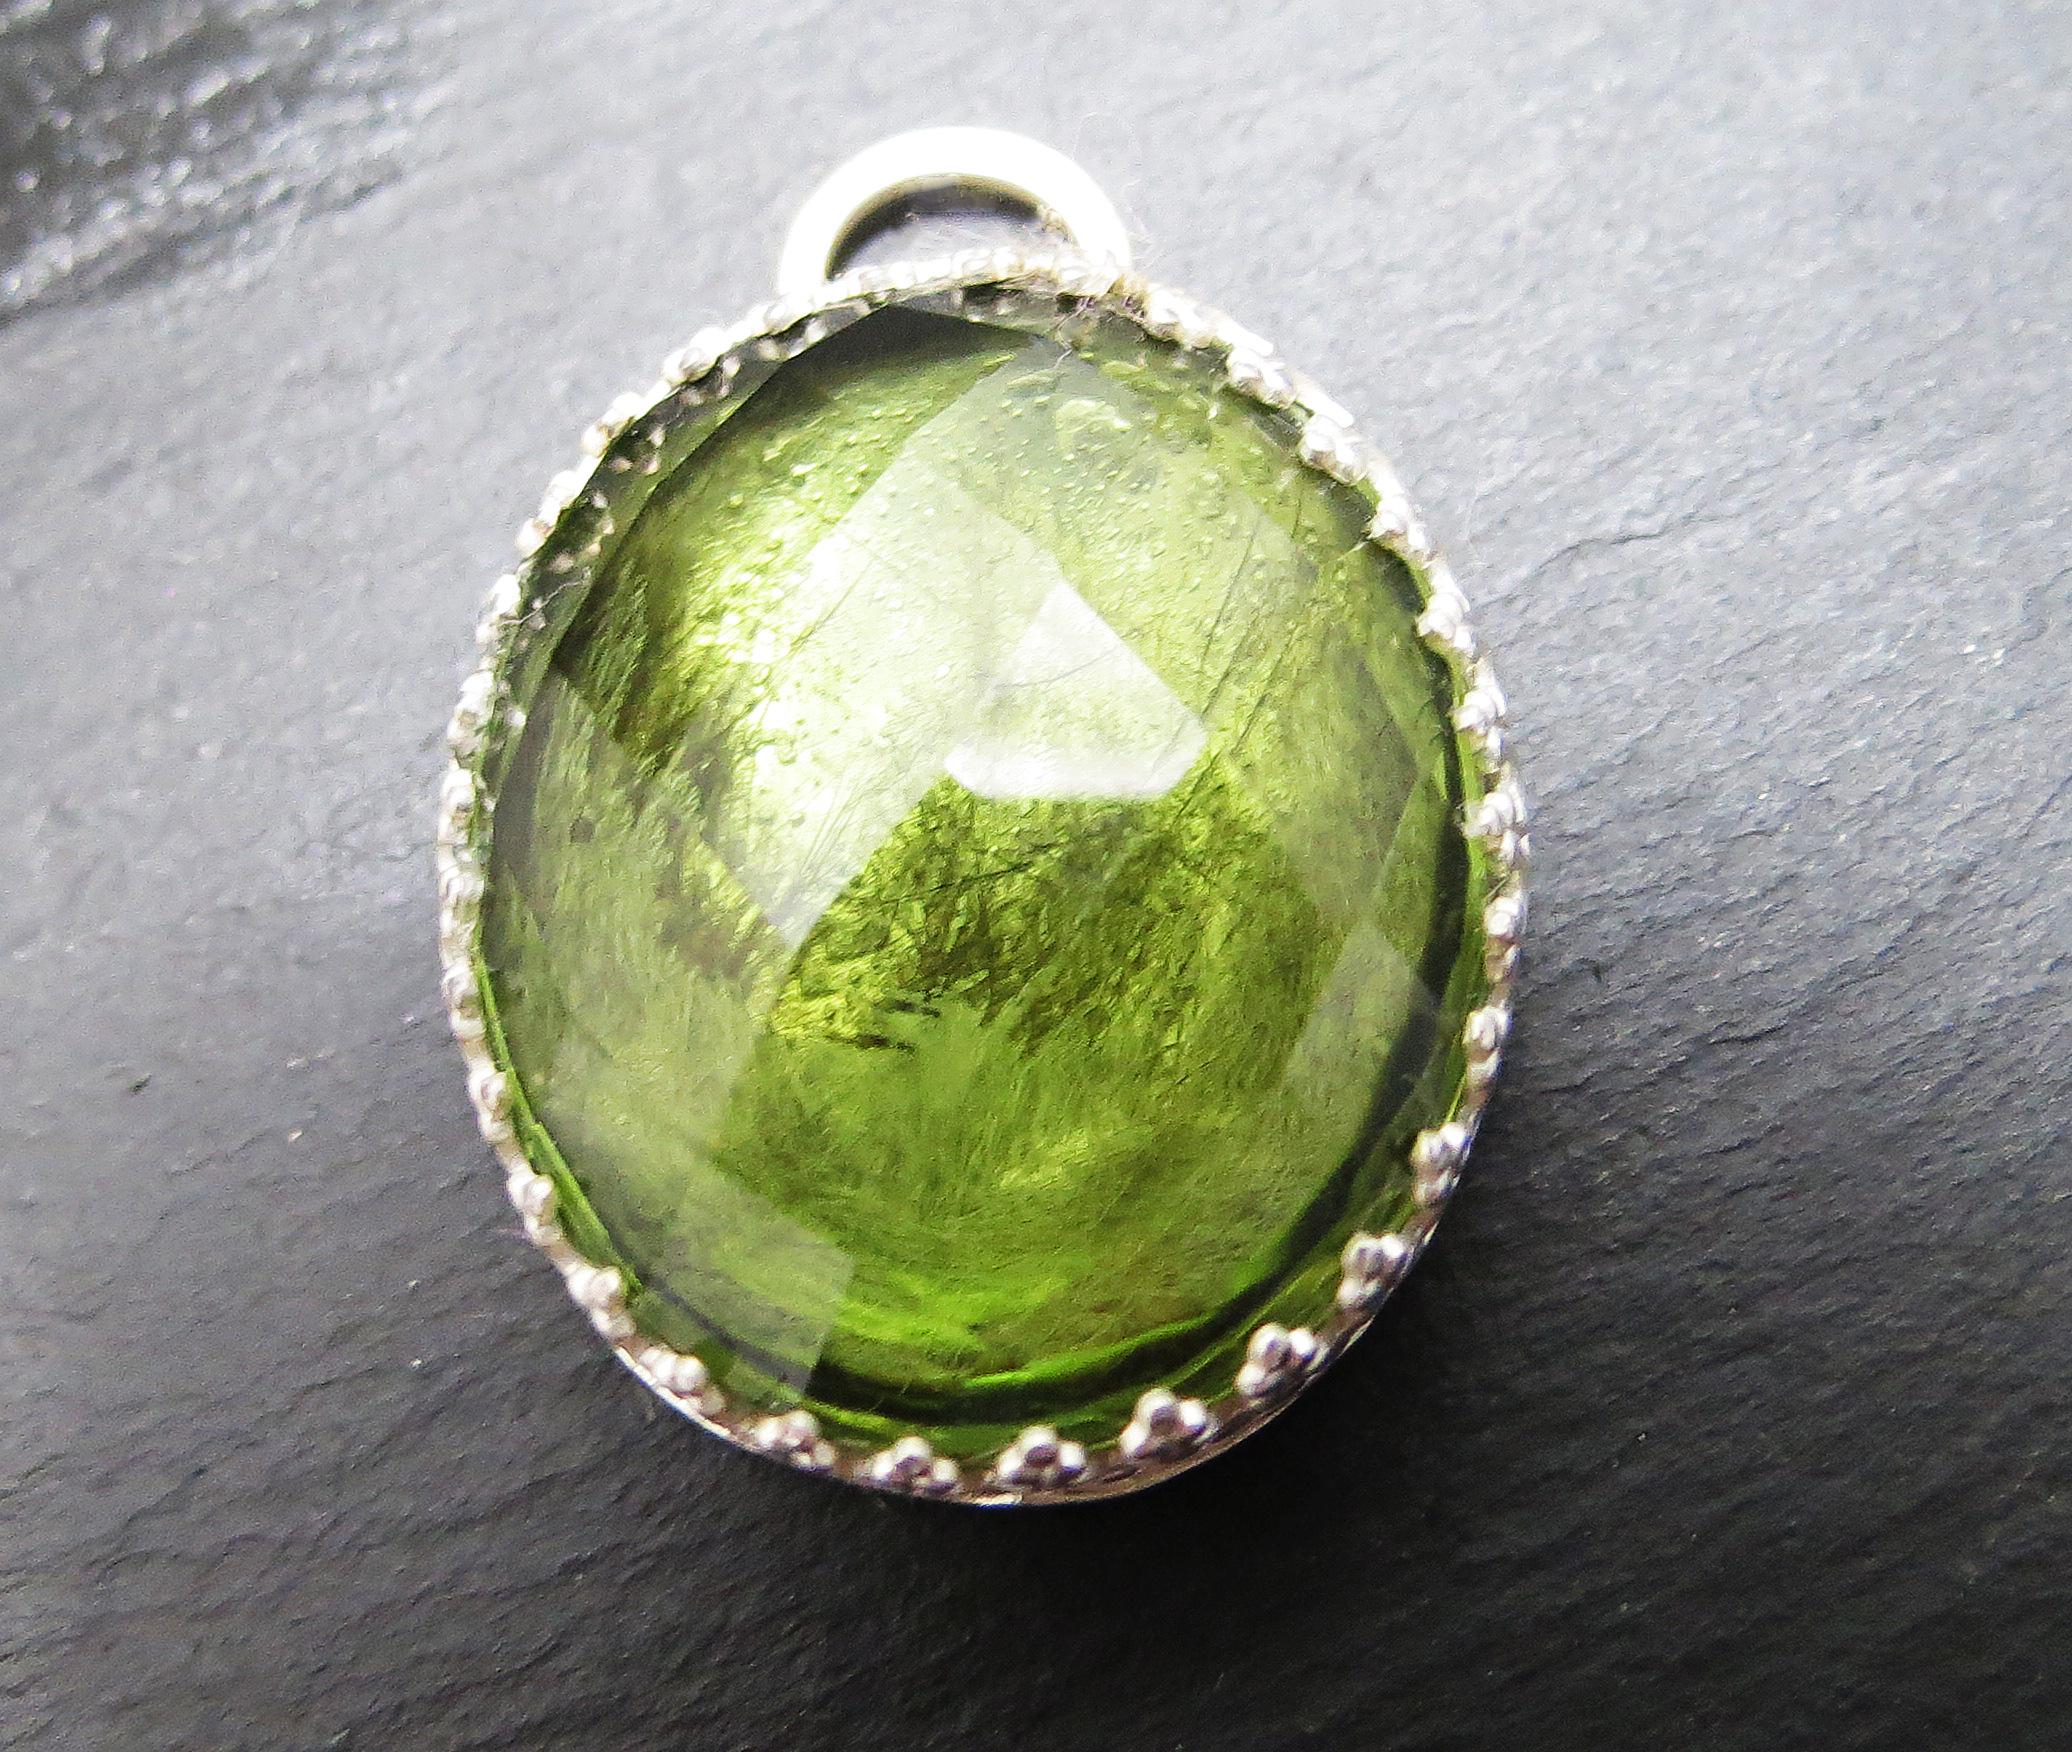 green jacob marley.jpg